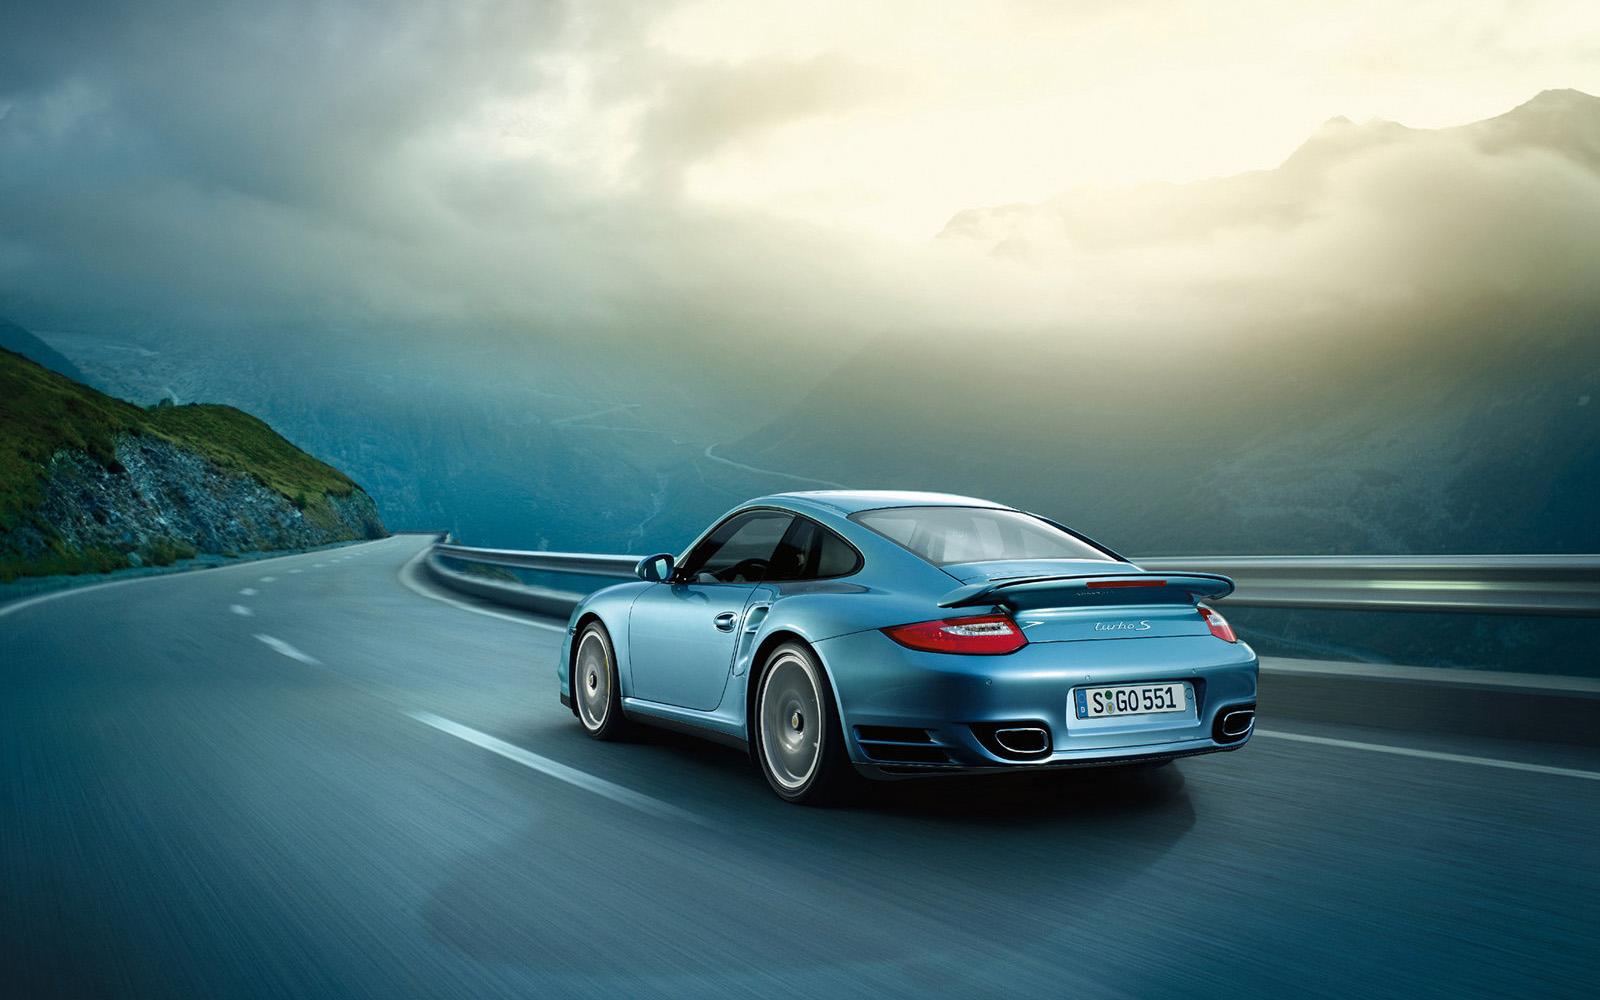 2011款保时捷911 turbo s